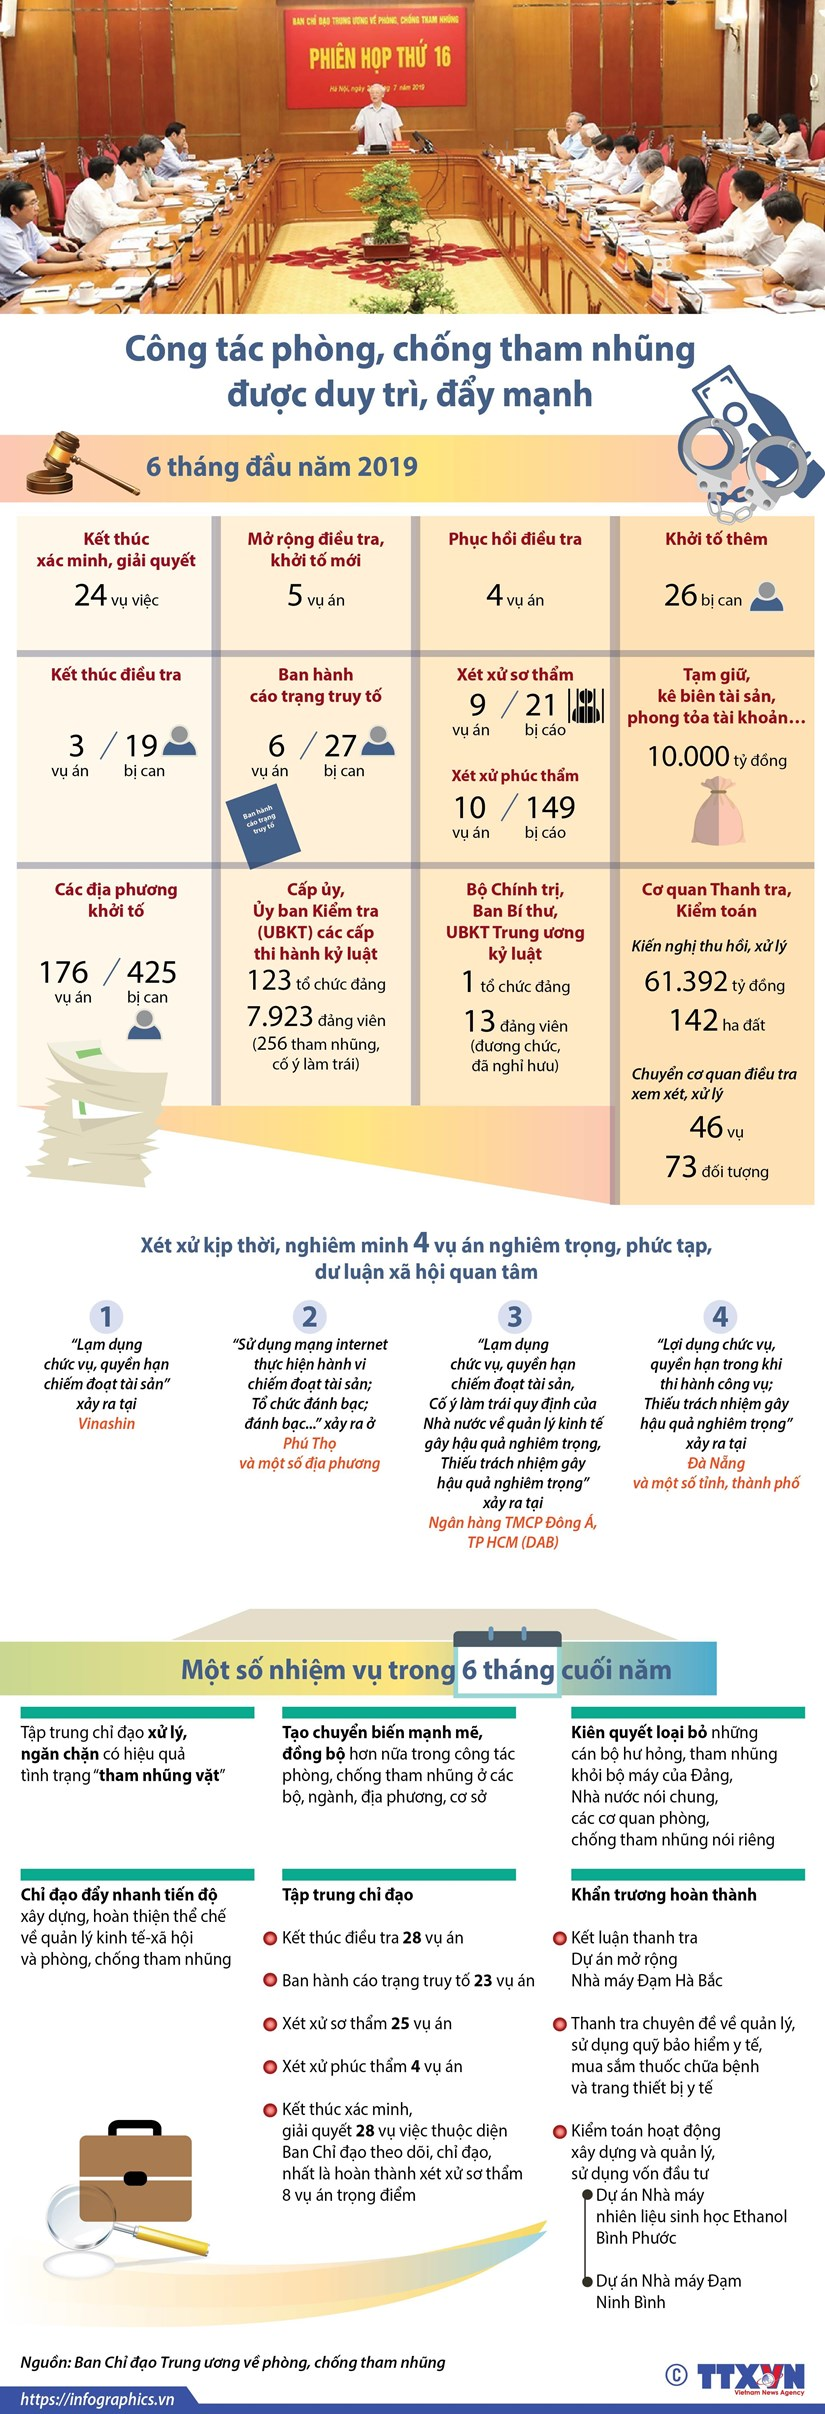 [Infographics] So lieu ve phong chong tham nhung 6 thang dau nam hinh anh 1